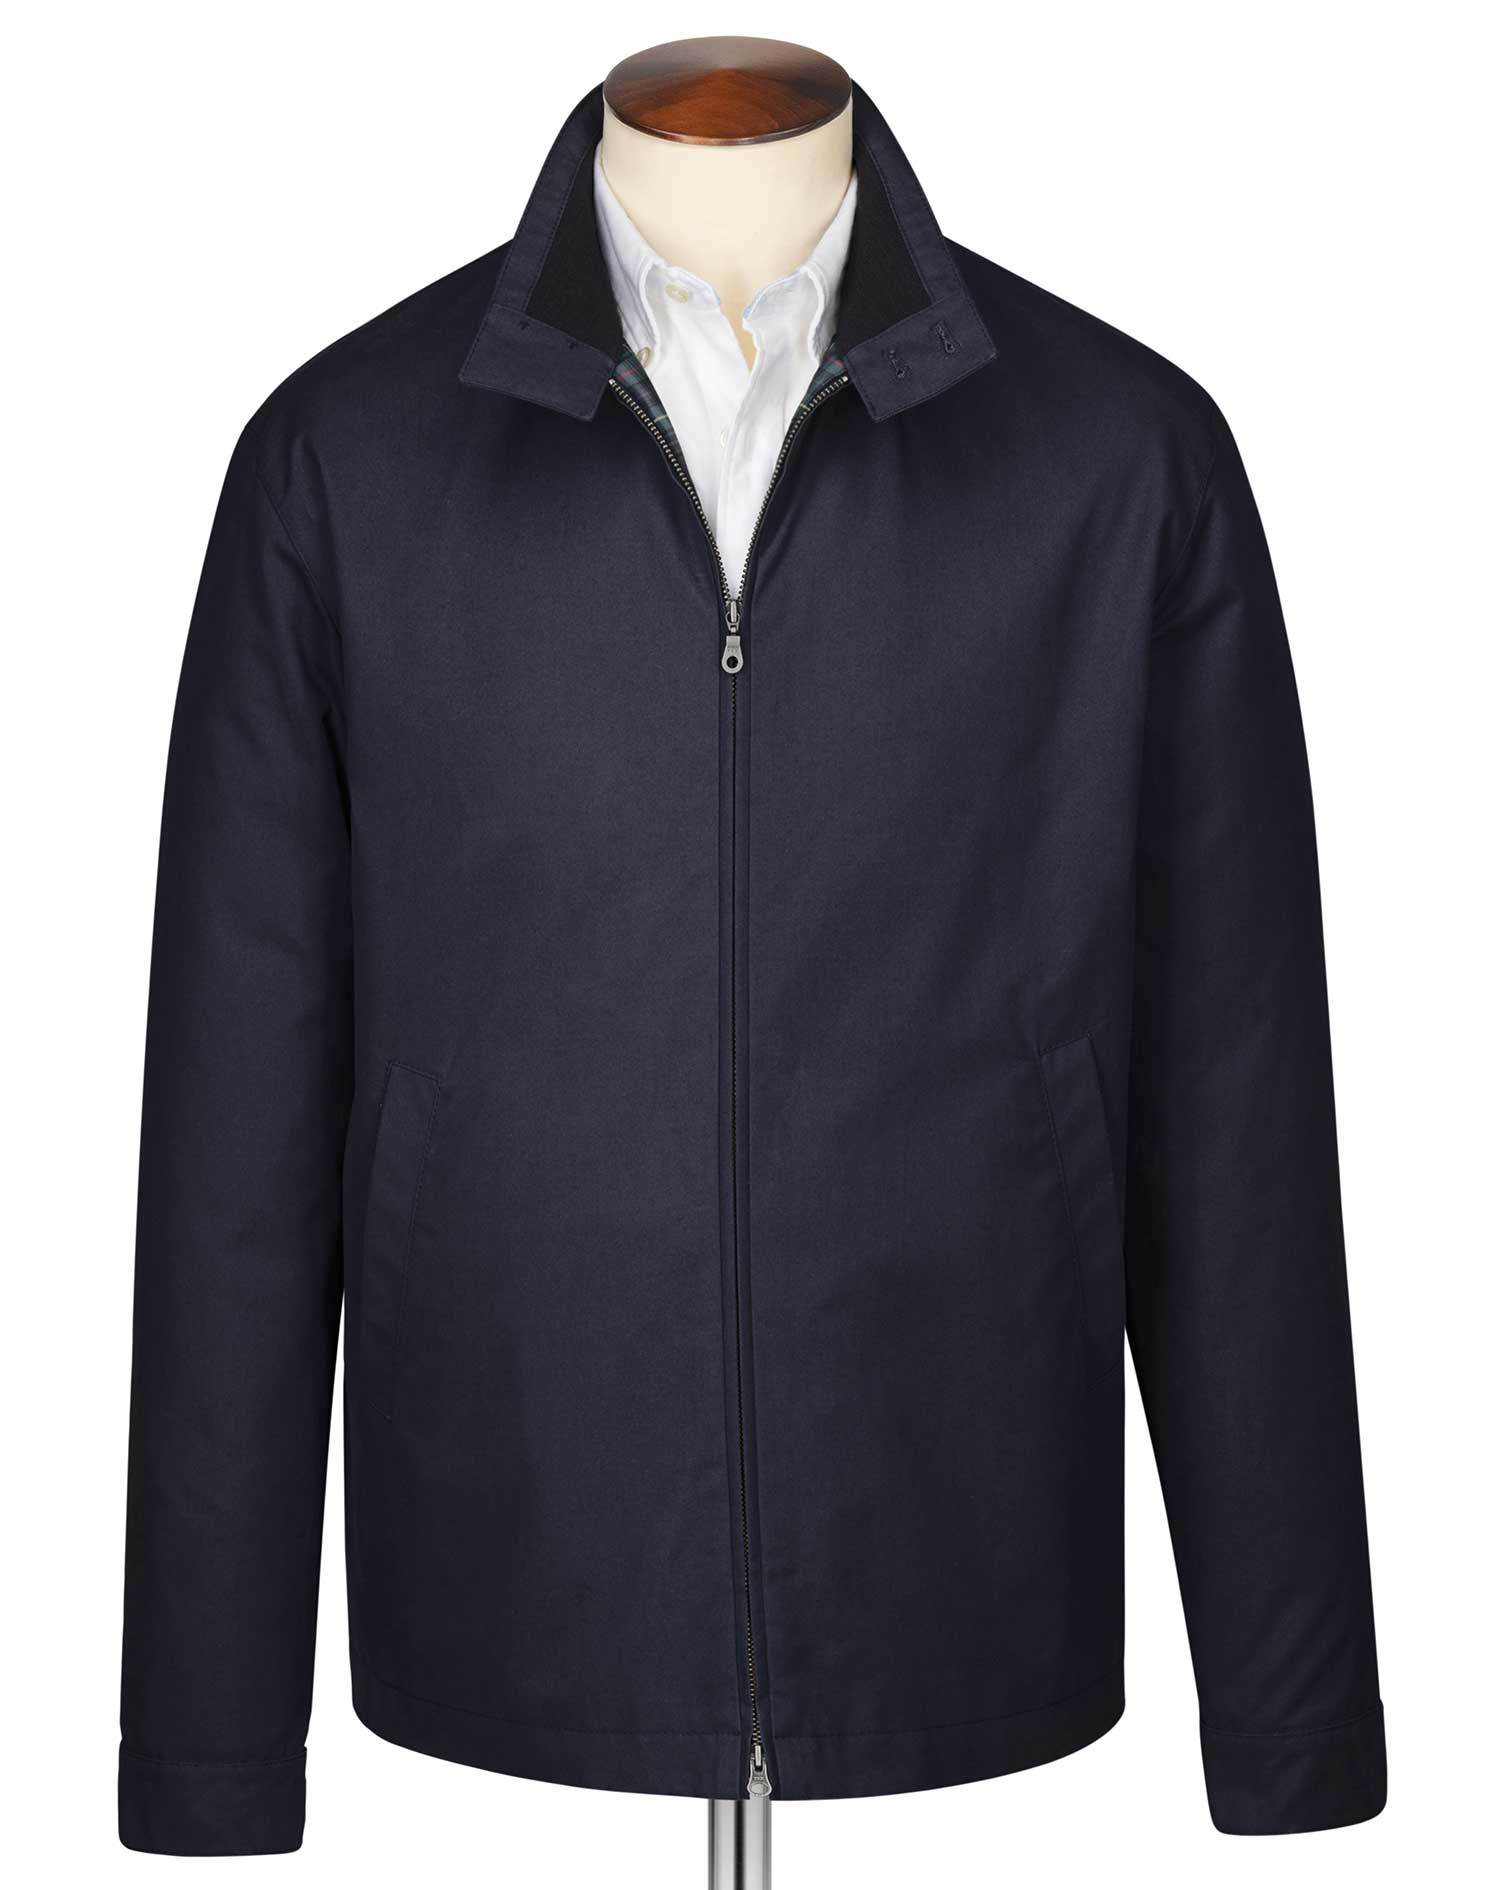 Navy Harrington Cotton Jacket Size 42 Regular by Charles Tyrwhitt